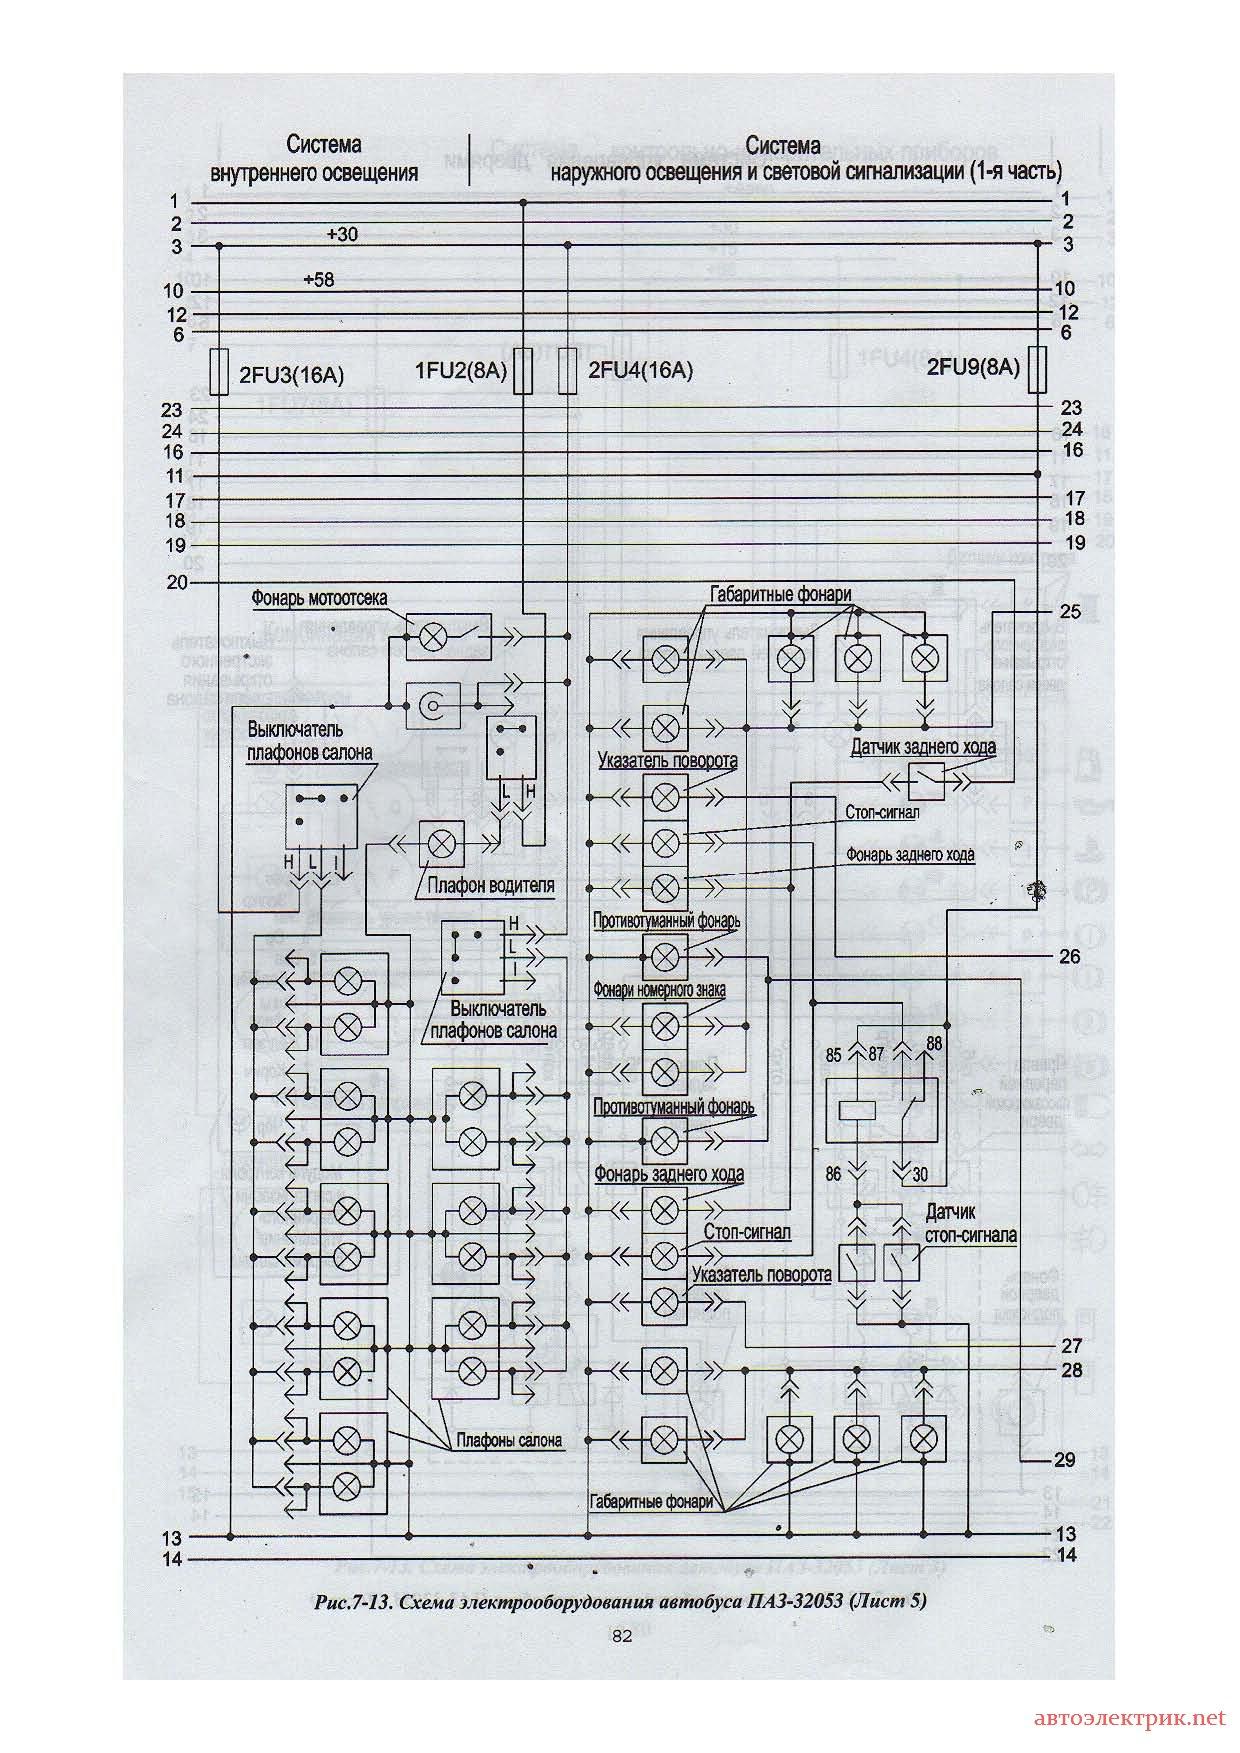 квартиру электропроводка паз 32054 схема приготовить беляши